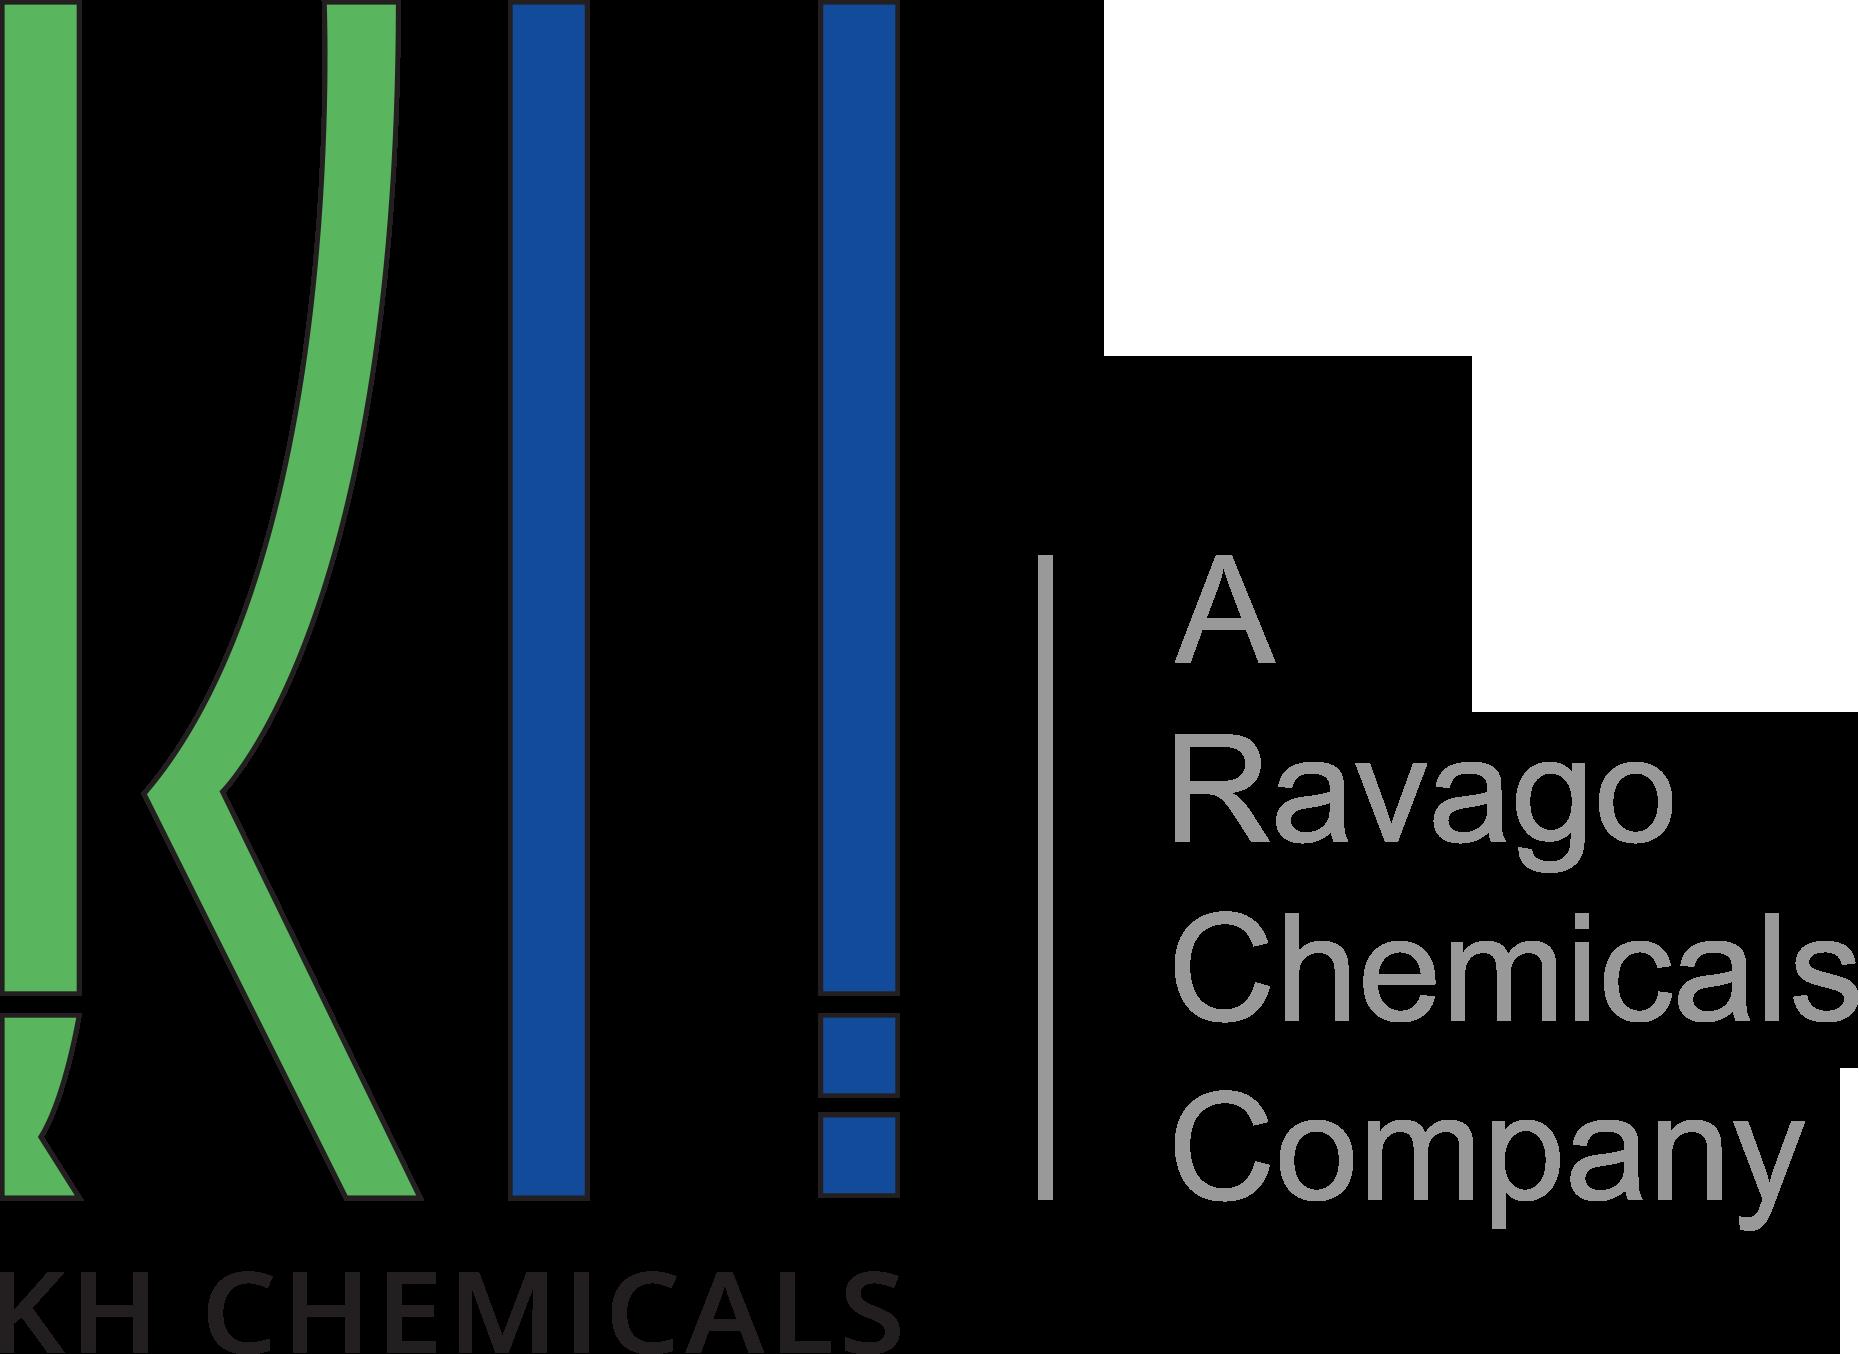 logo- kh chemicals